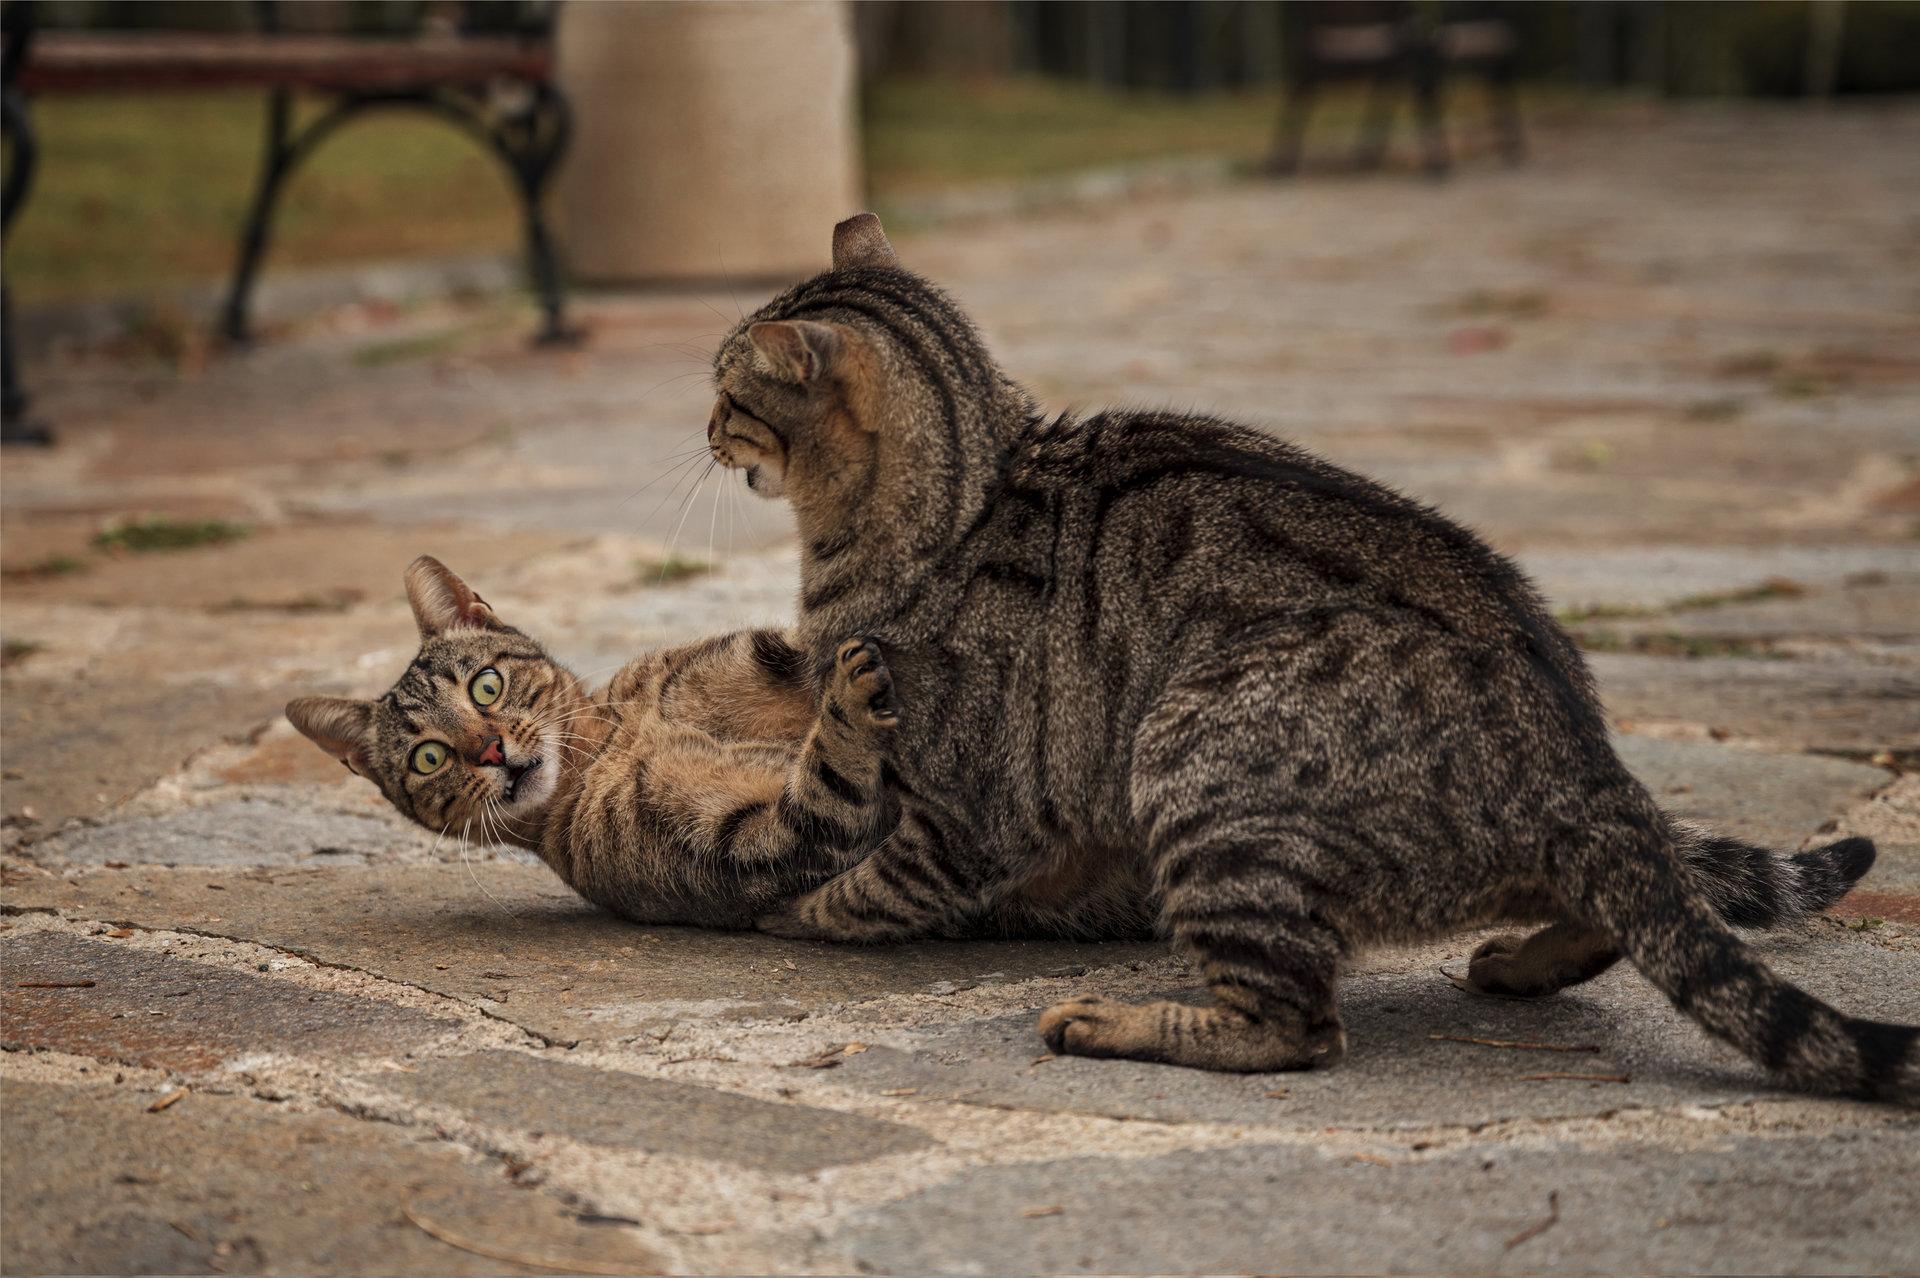 Cat me if you can!   Author rositsa_dimitrova   PHOTO FORUM